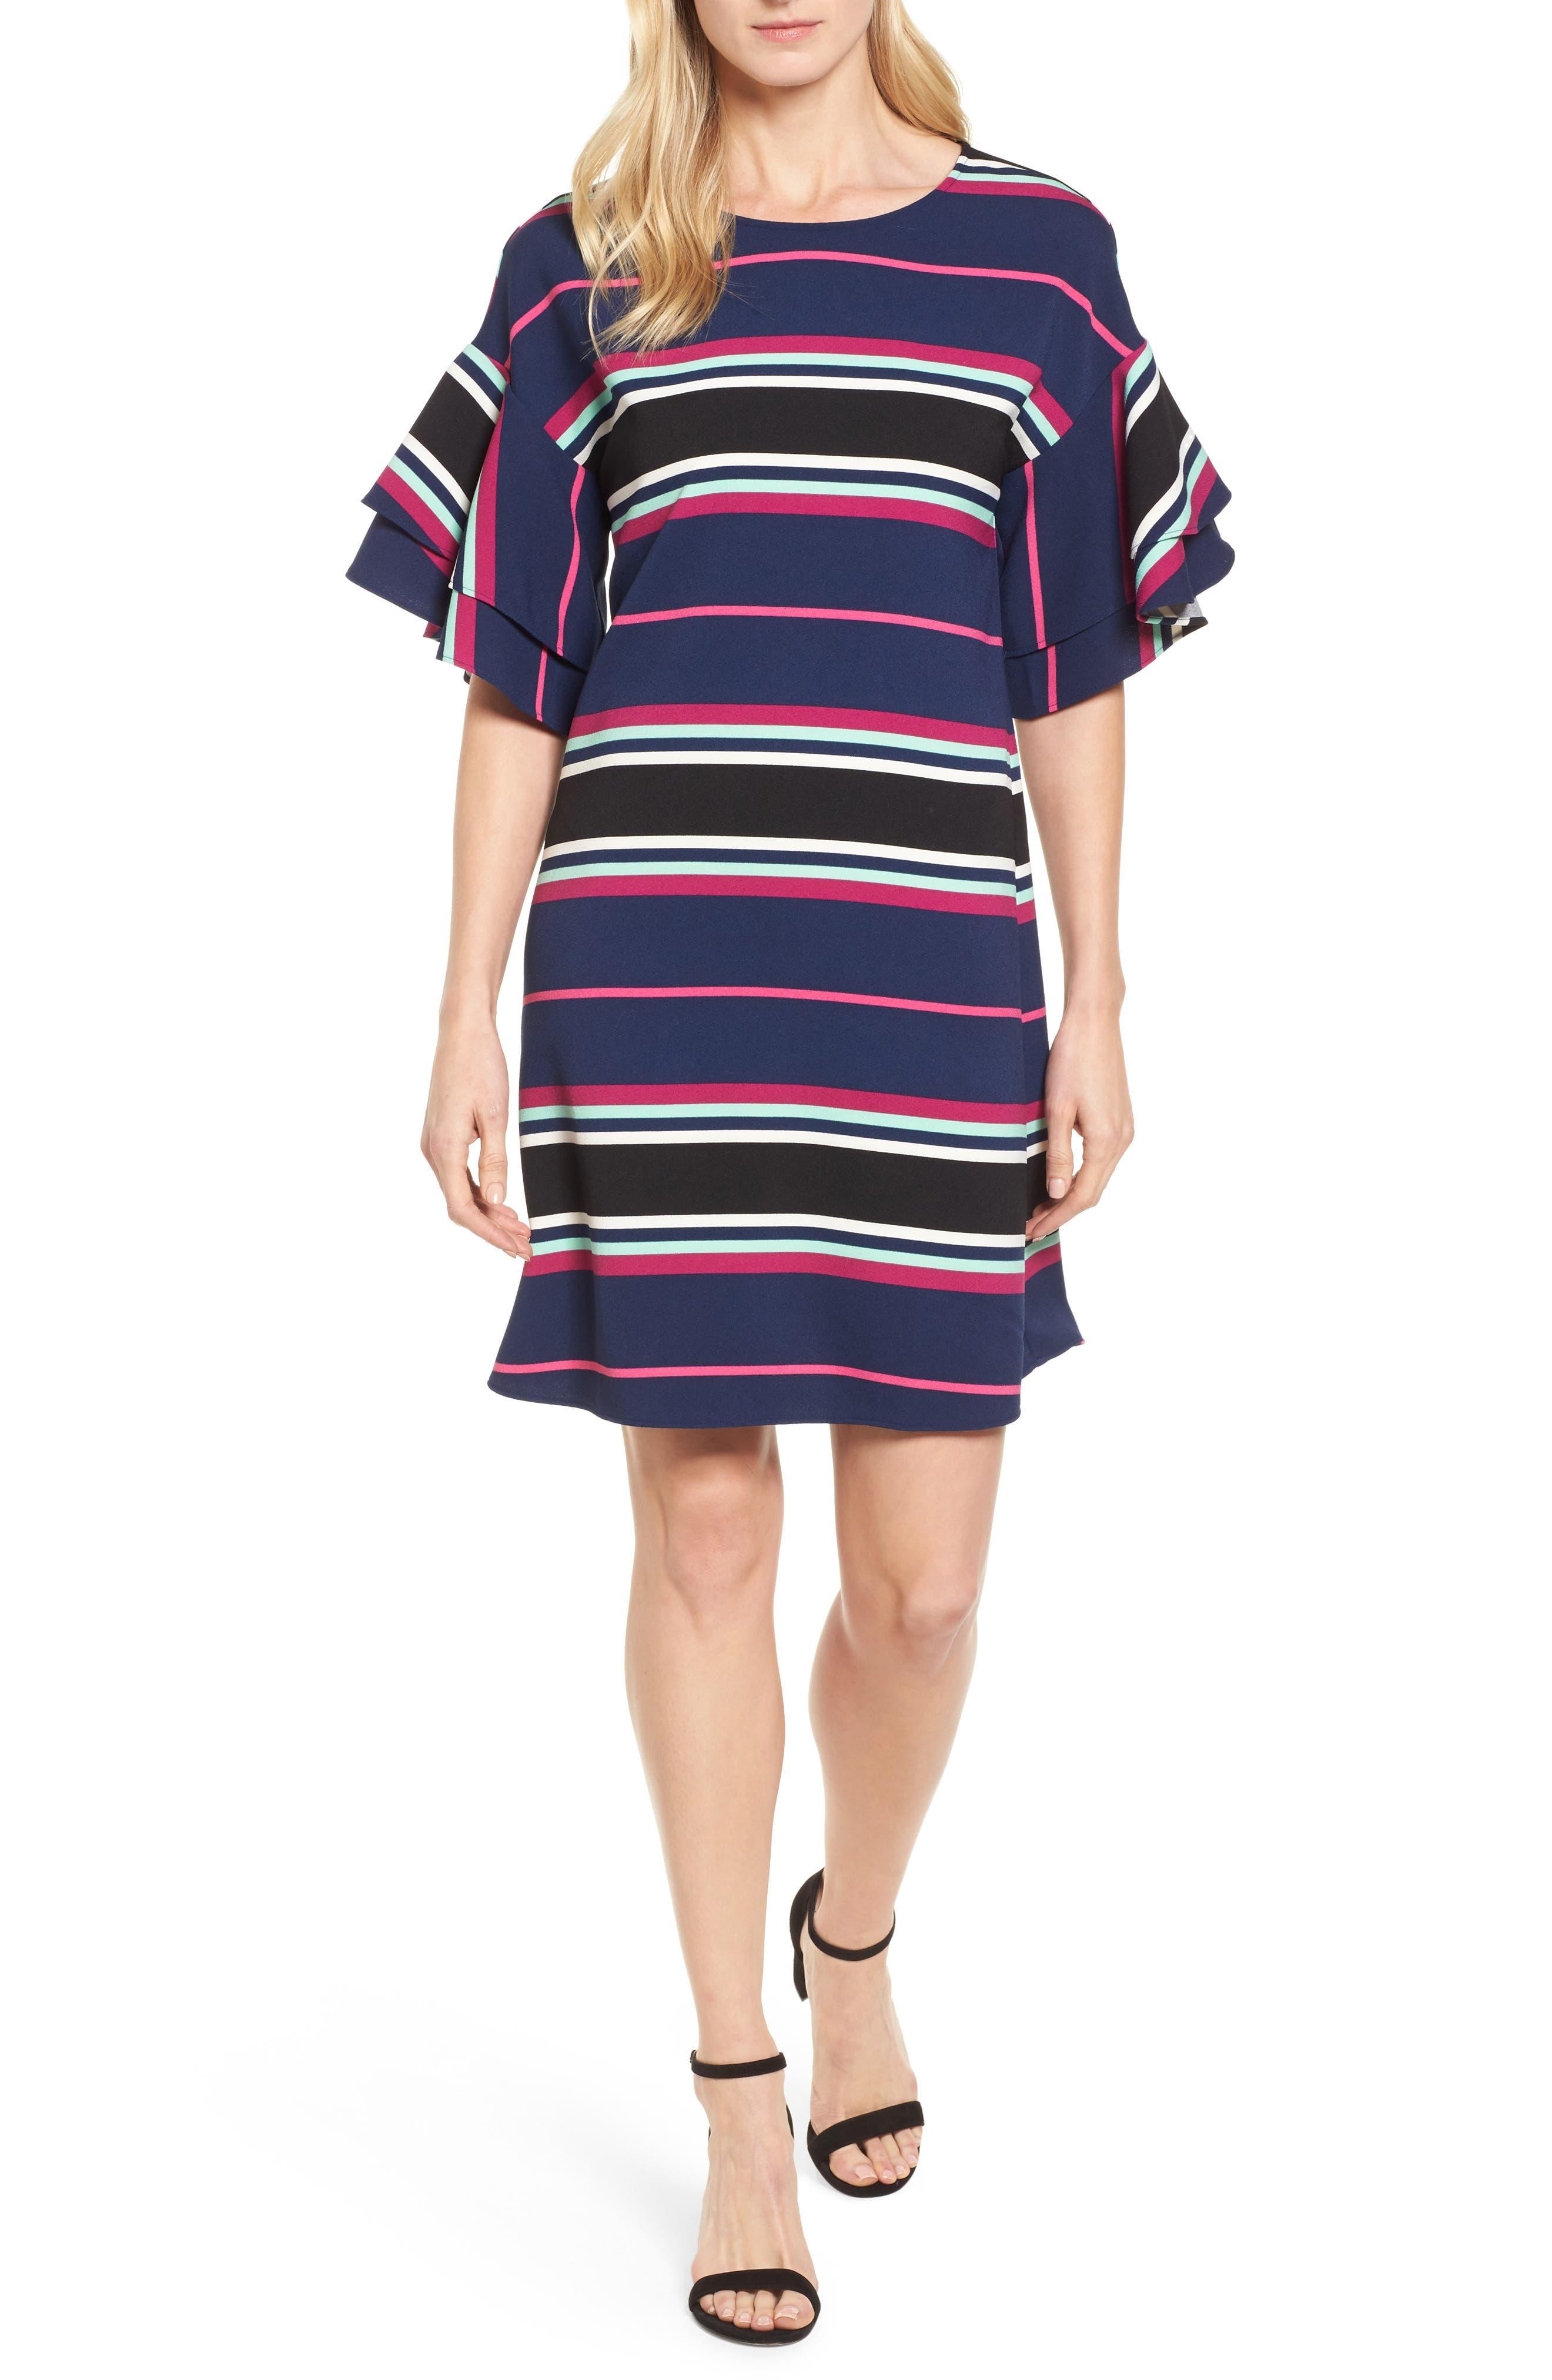 Ruffle Sleeve Shift Dress,                             Main thumbnail 1, color,                             Navy- Pink Multi Stripe